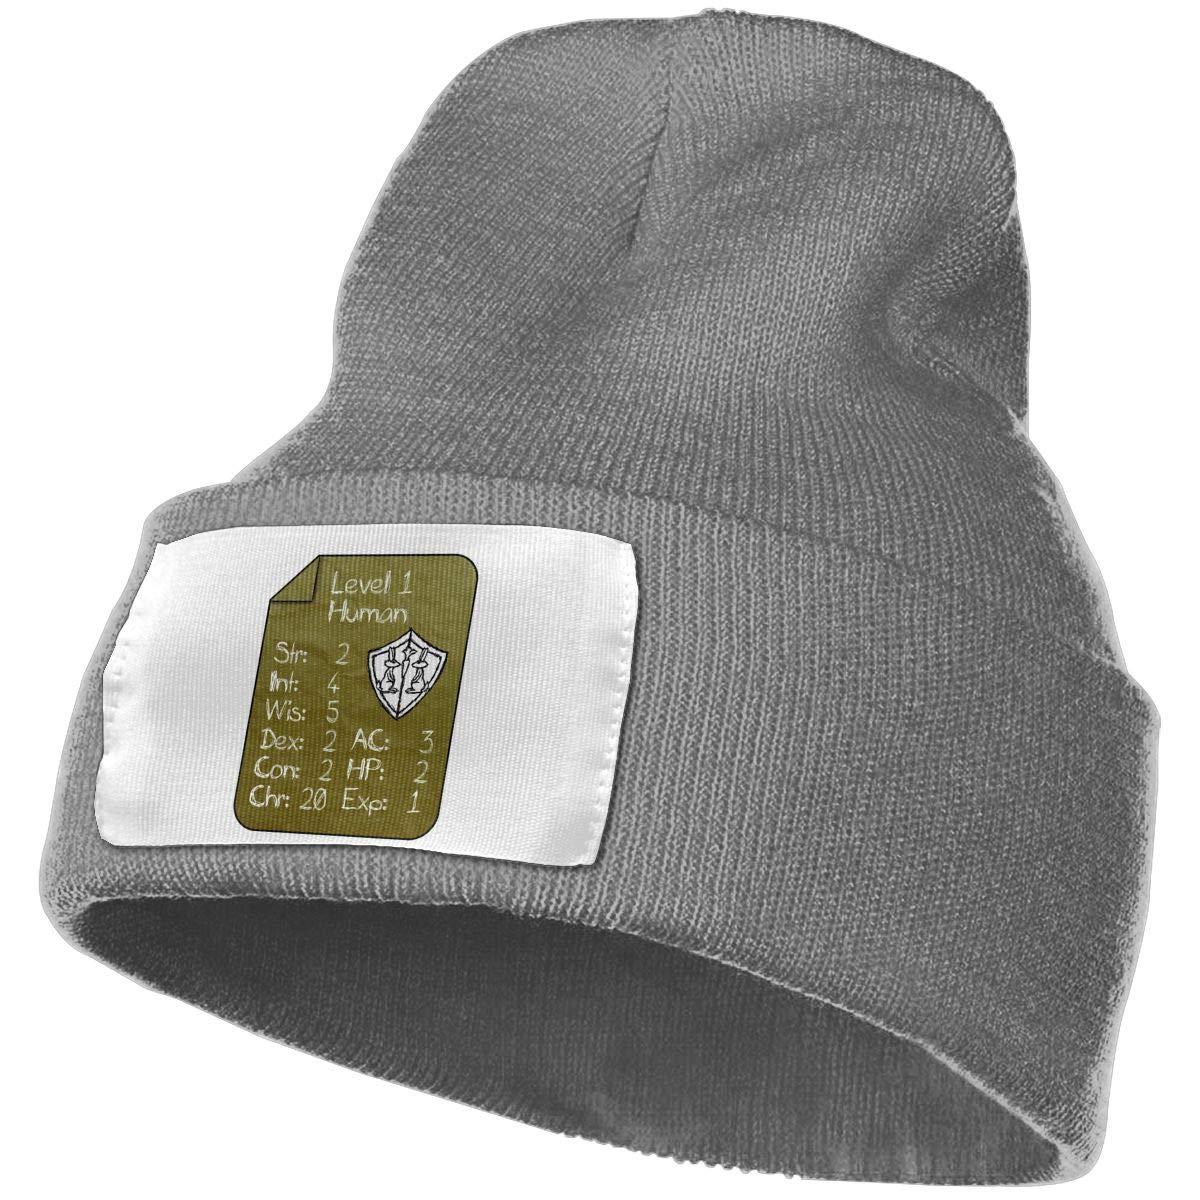 Adults Level 1 Human Elastic Knitted Beanie Cap Winter Warm Skull Hats